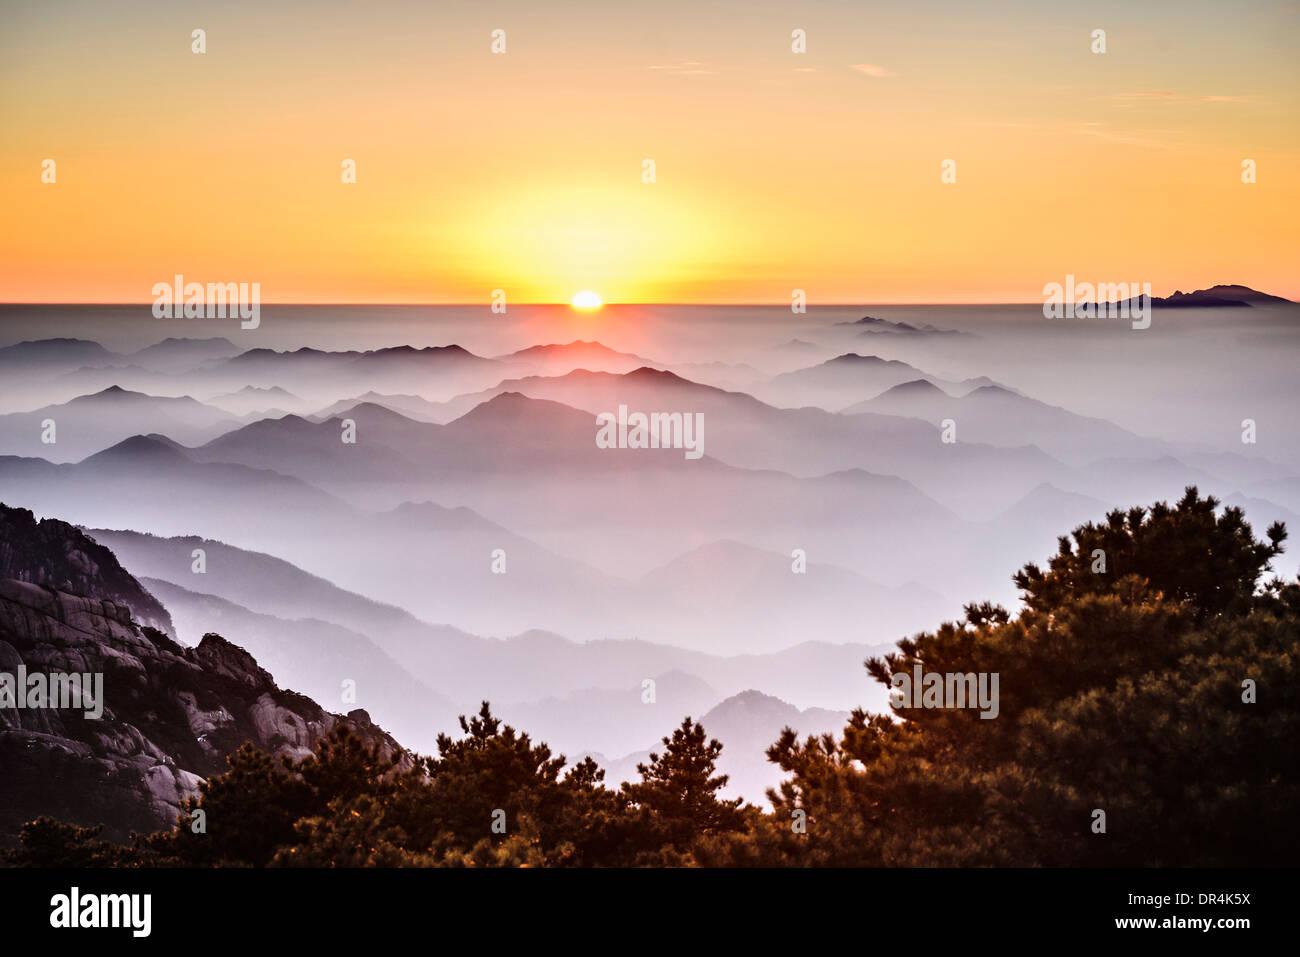 Vuelco de niebla montañas rocosas, Huangshan, Anhui, China Imagen De Stock